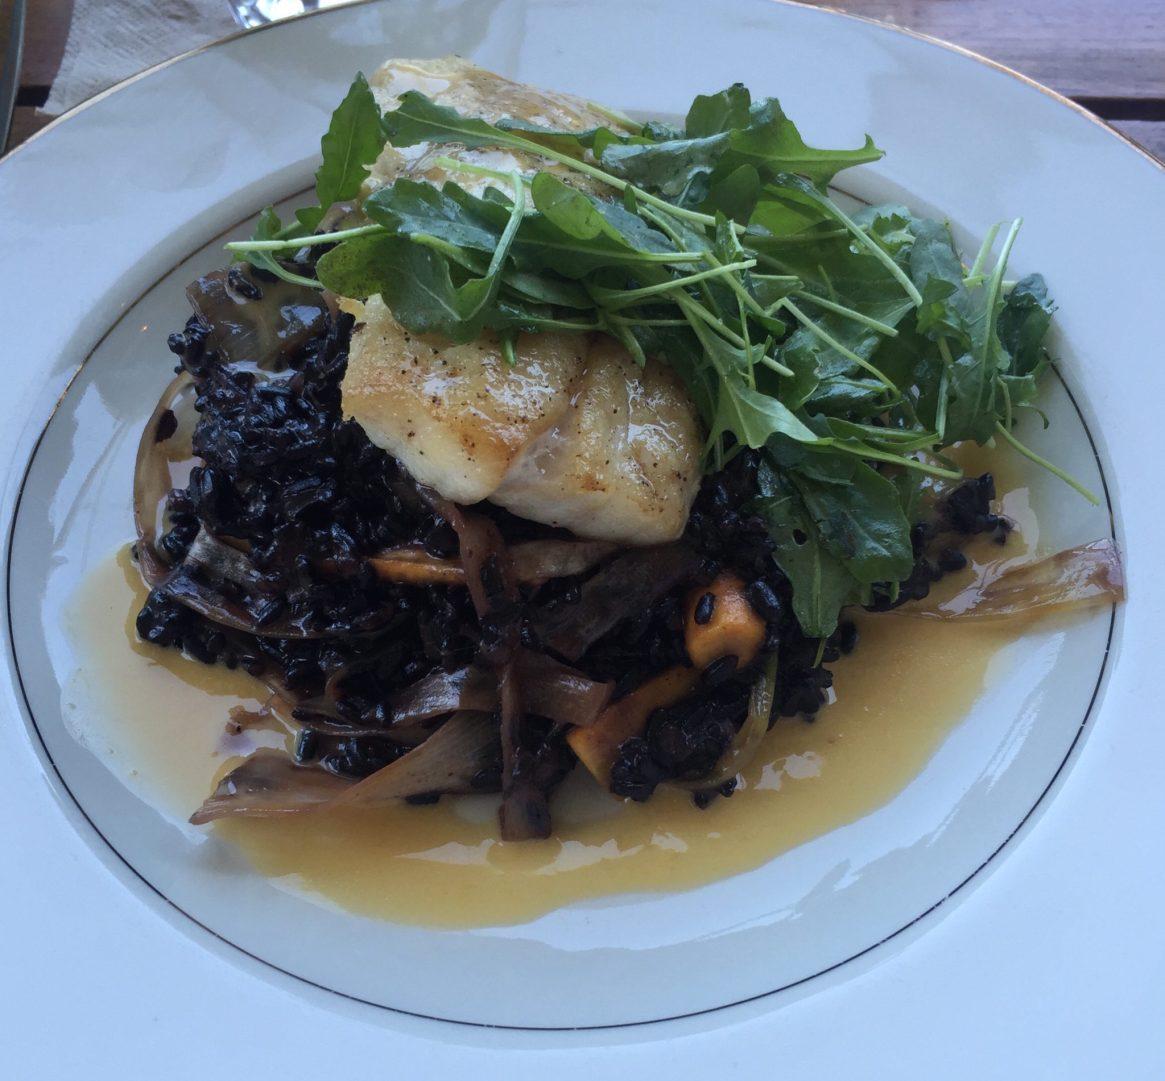 The Plant Cafe, Pier 3, San Francisco, Cod, Black Rice